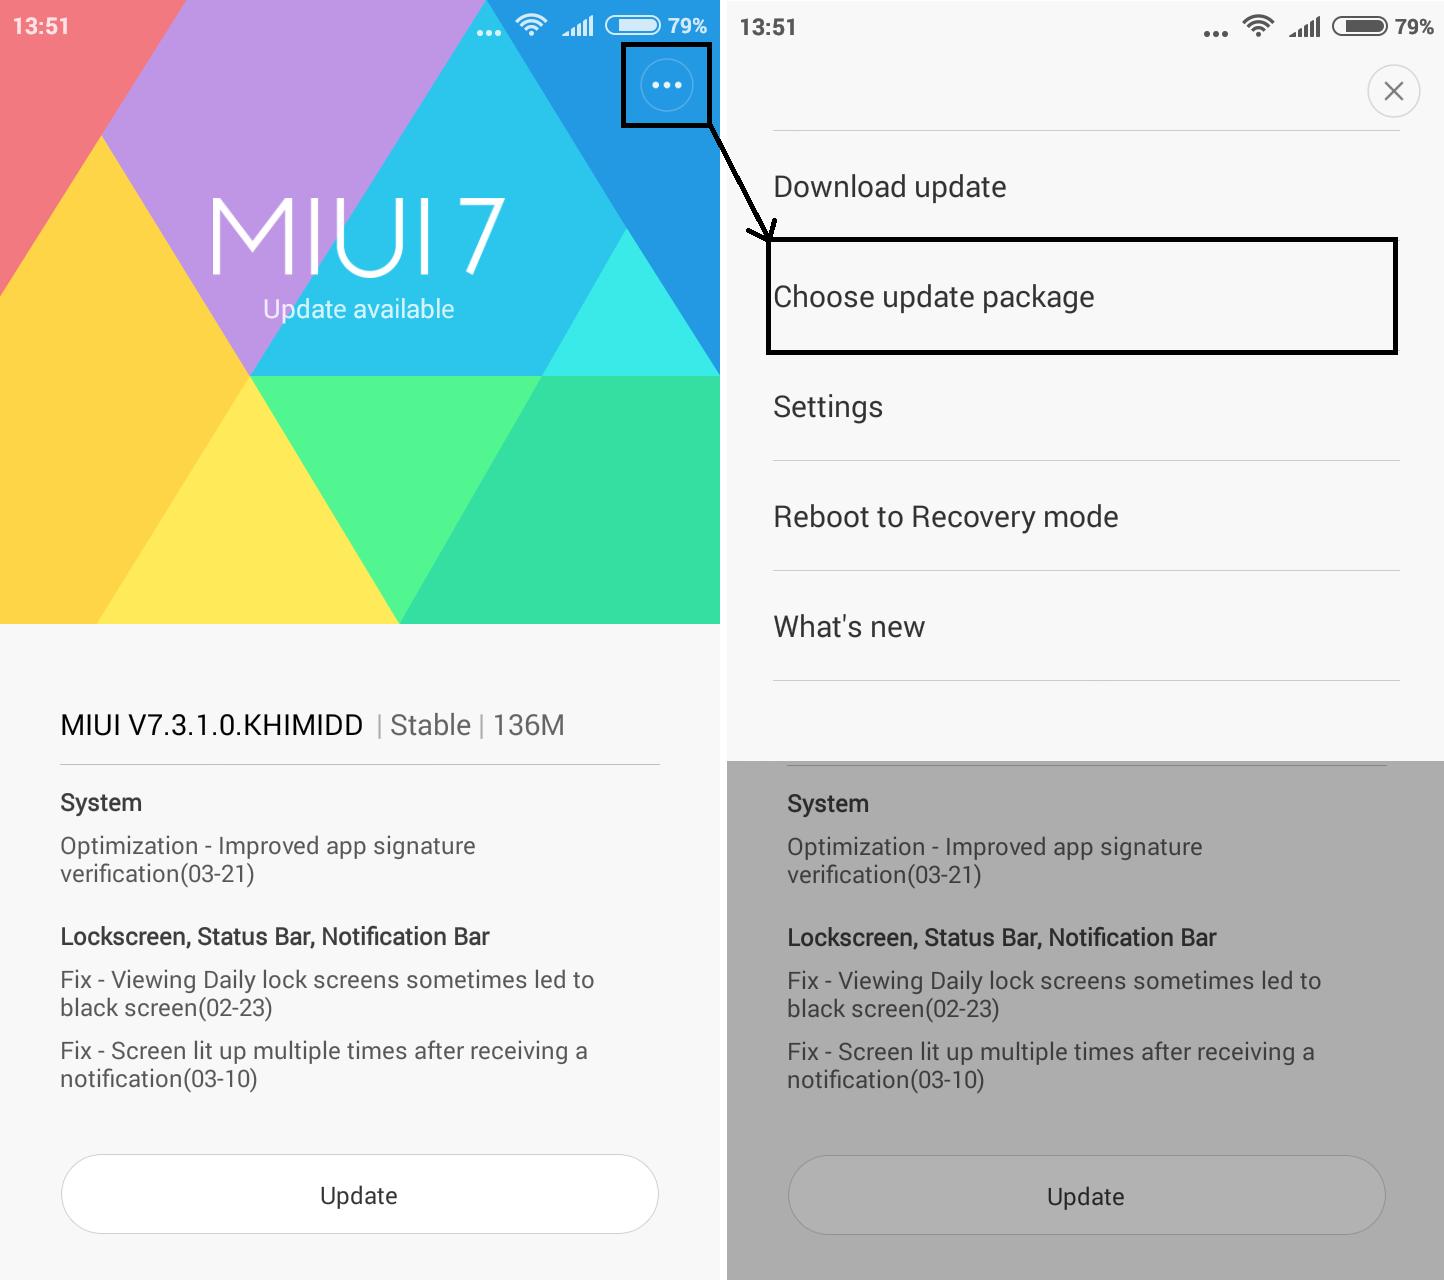 Screenshot_2016-06-30-13-51-18_com.android.updater [131050]